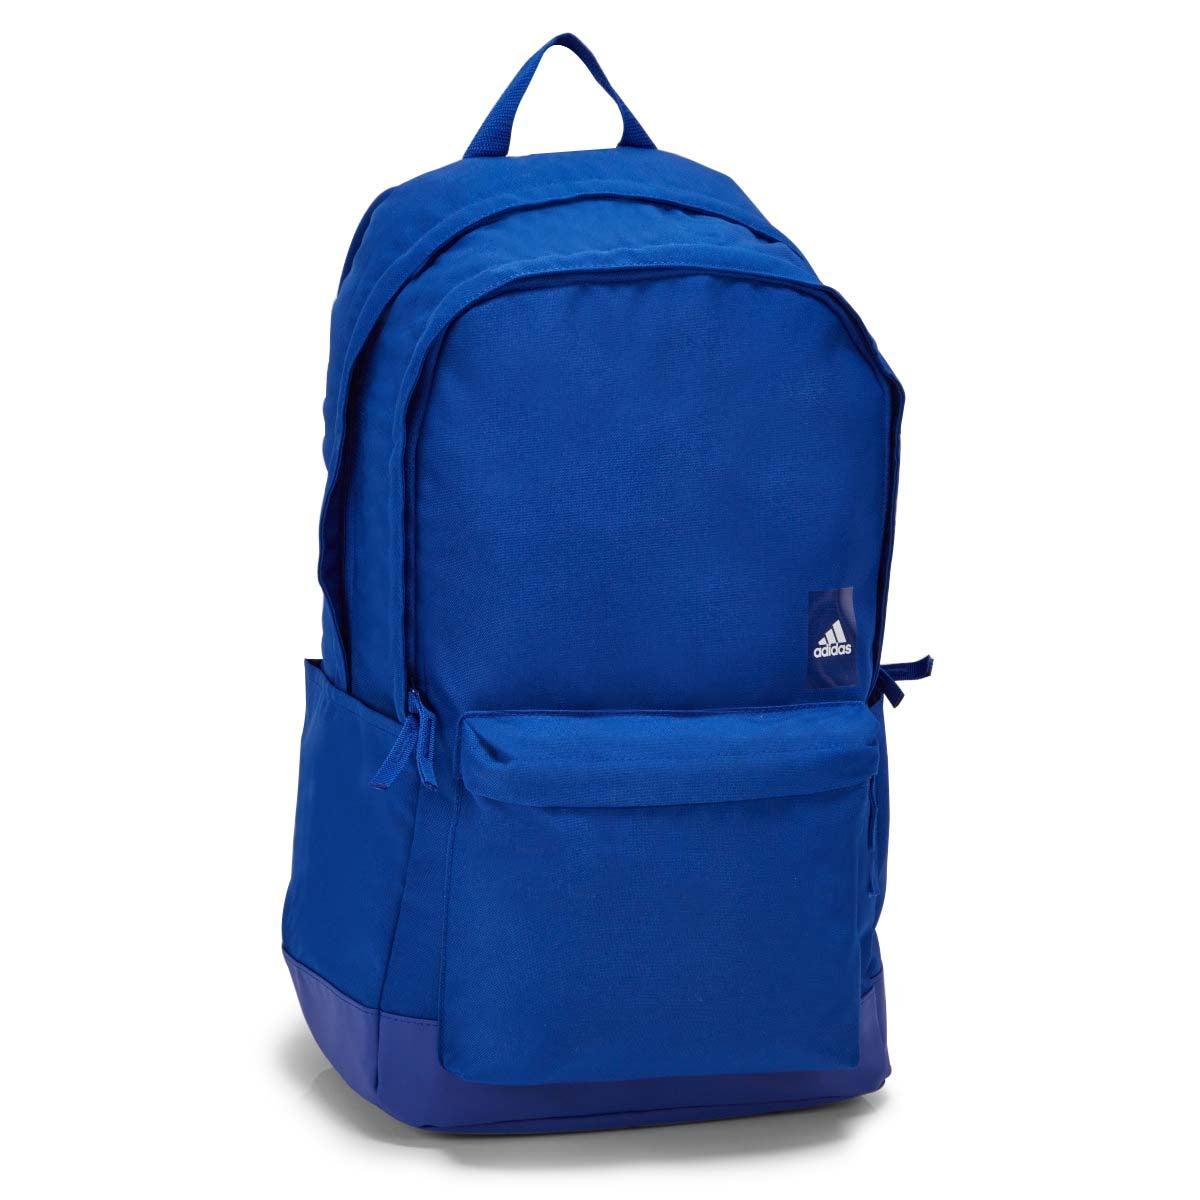 Adidas CLA BP Large ryl blu/wt backpack